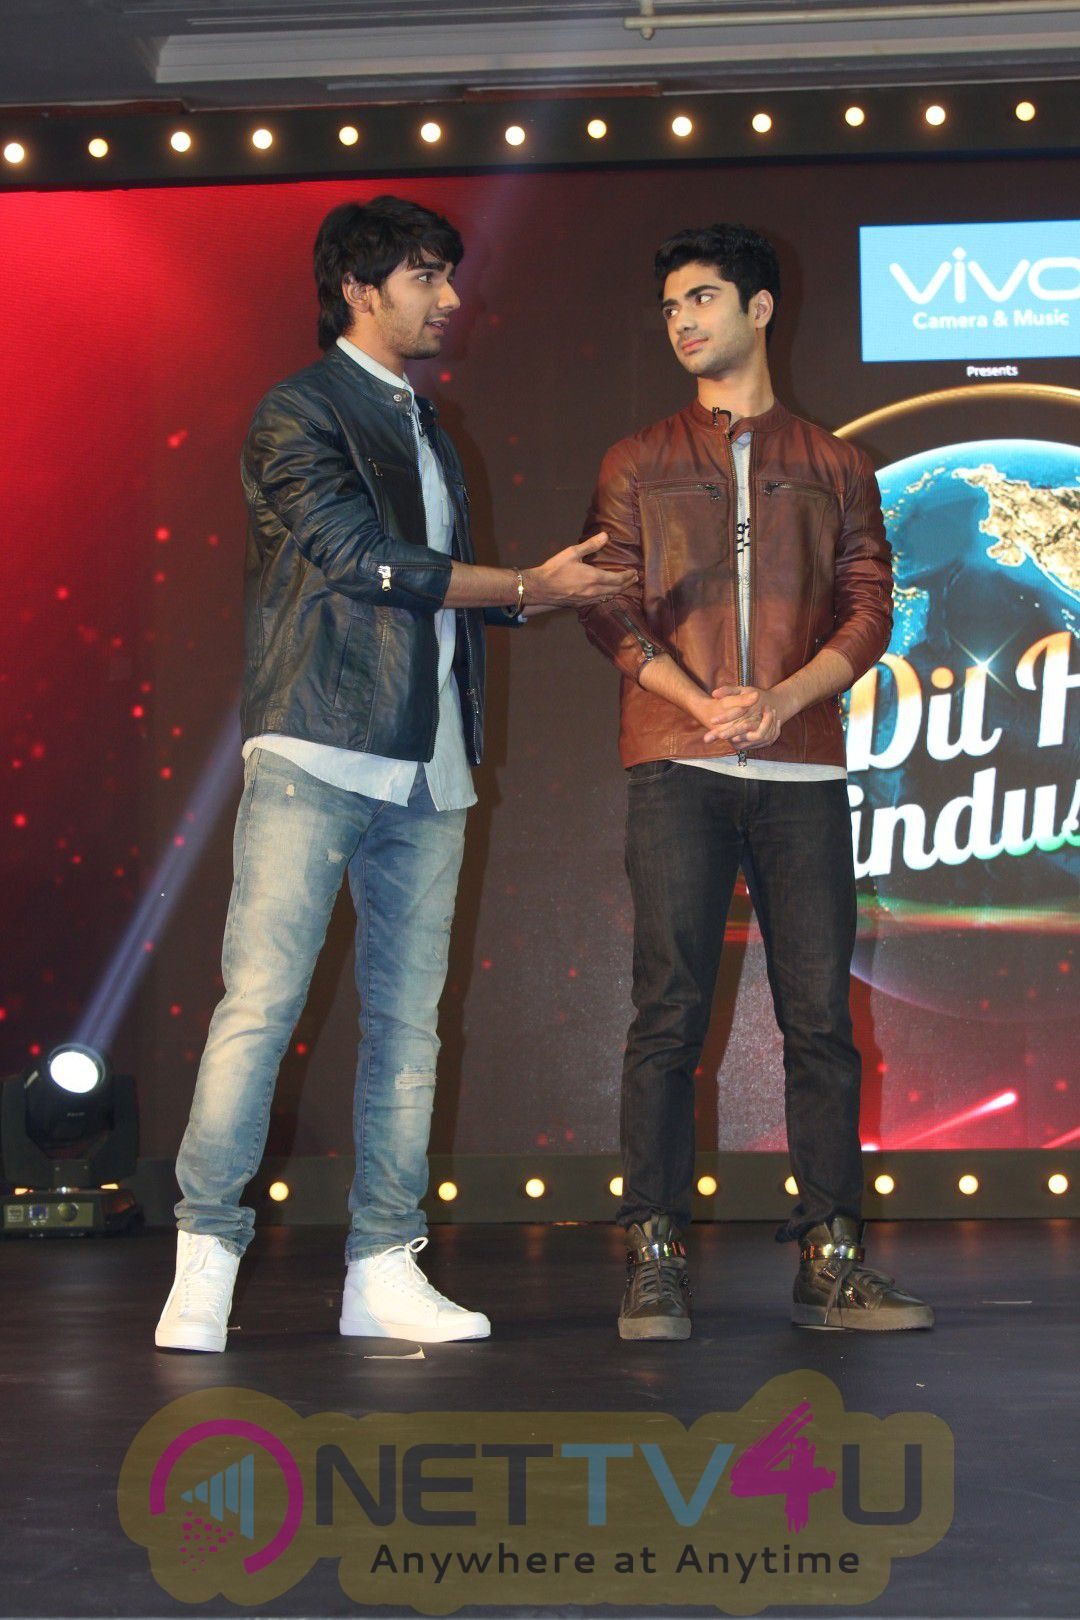 Star Plus New Reality Show Dil Hai Hindustani With Judge Karan Johar, Badshah & Others Images Hindi Gallery